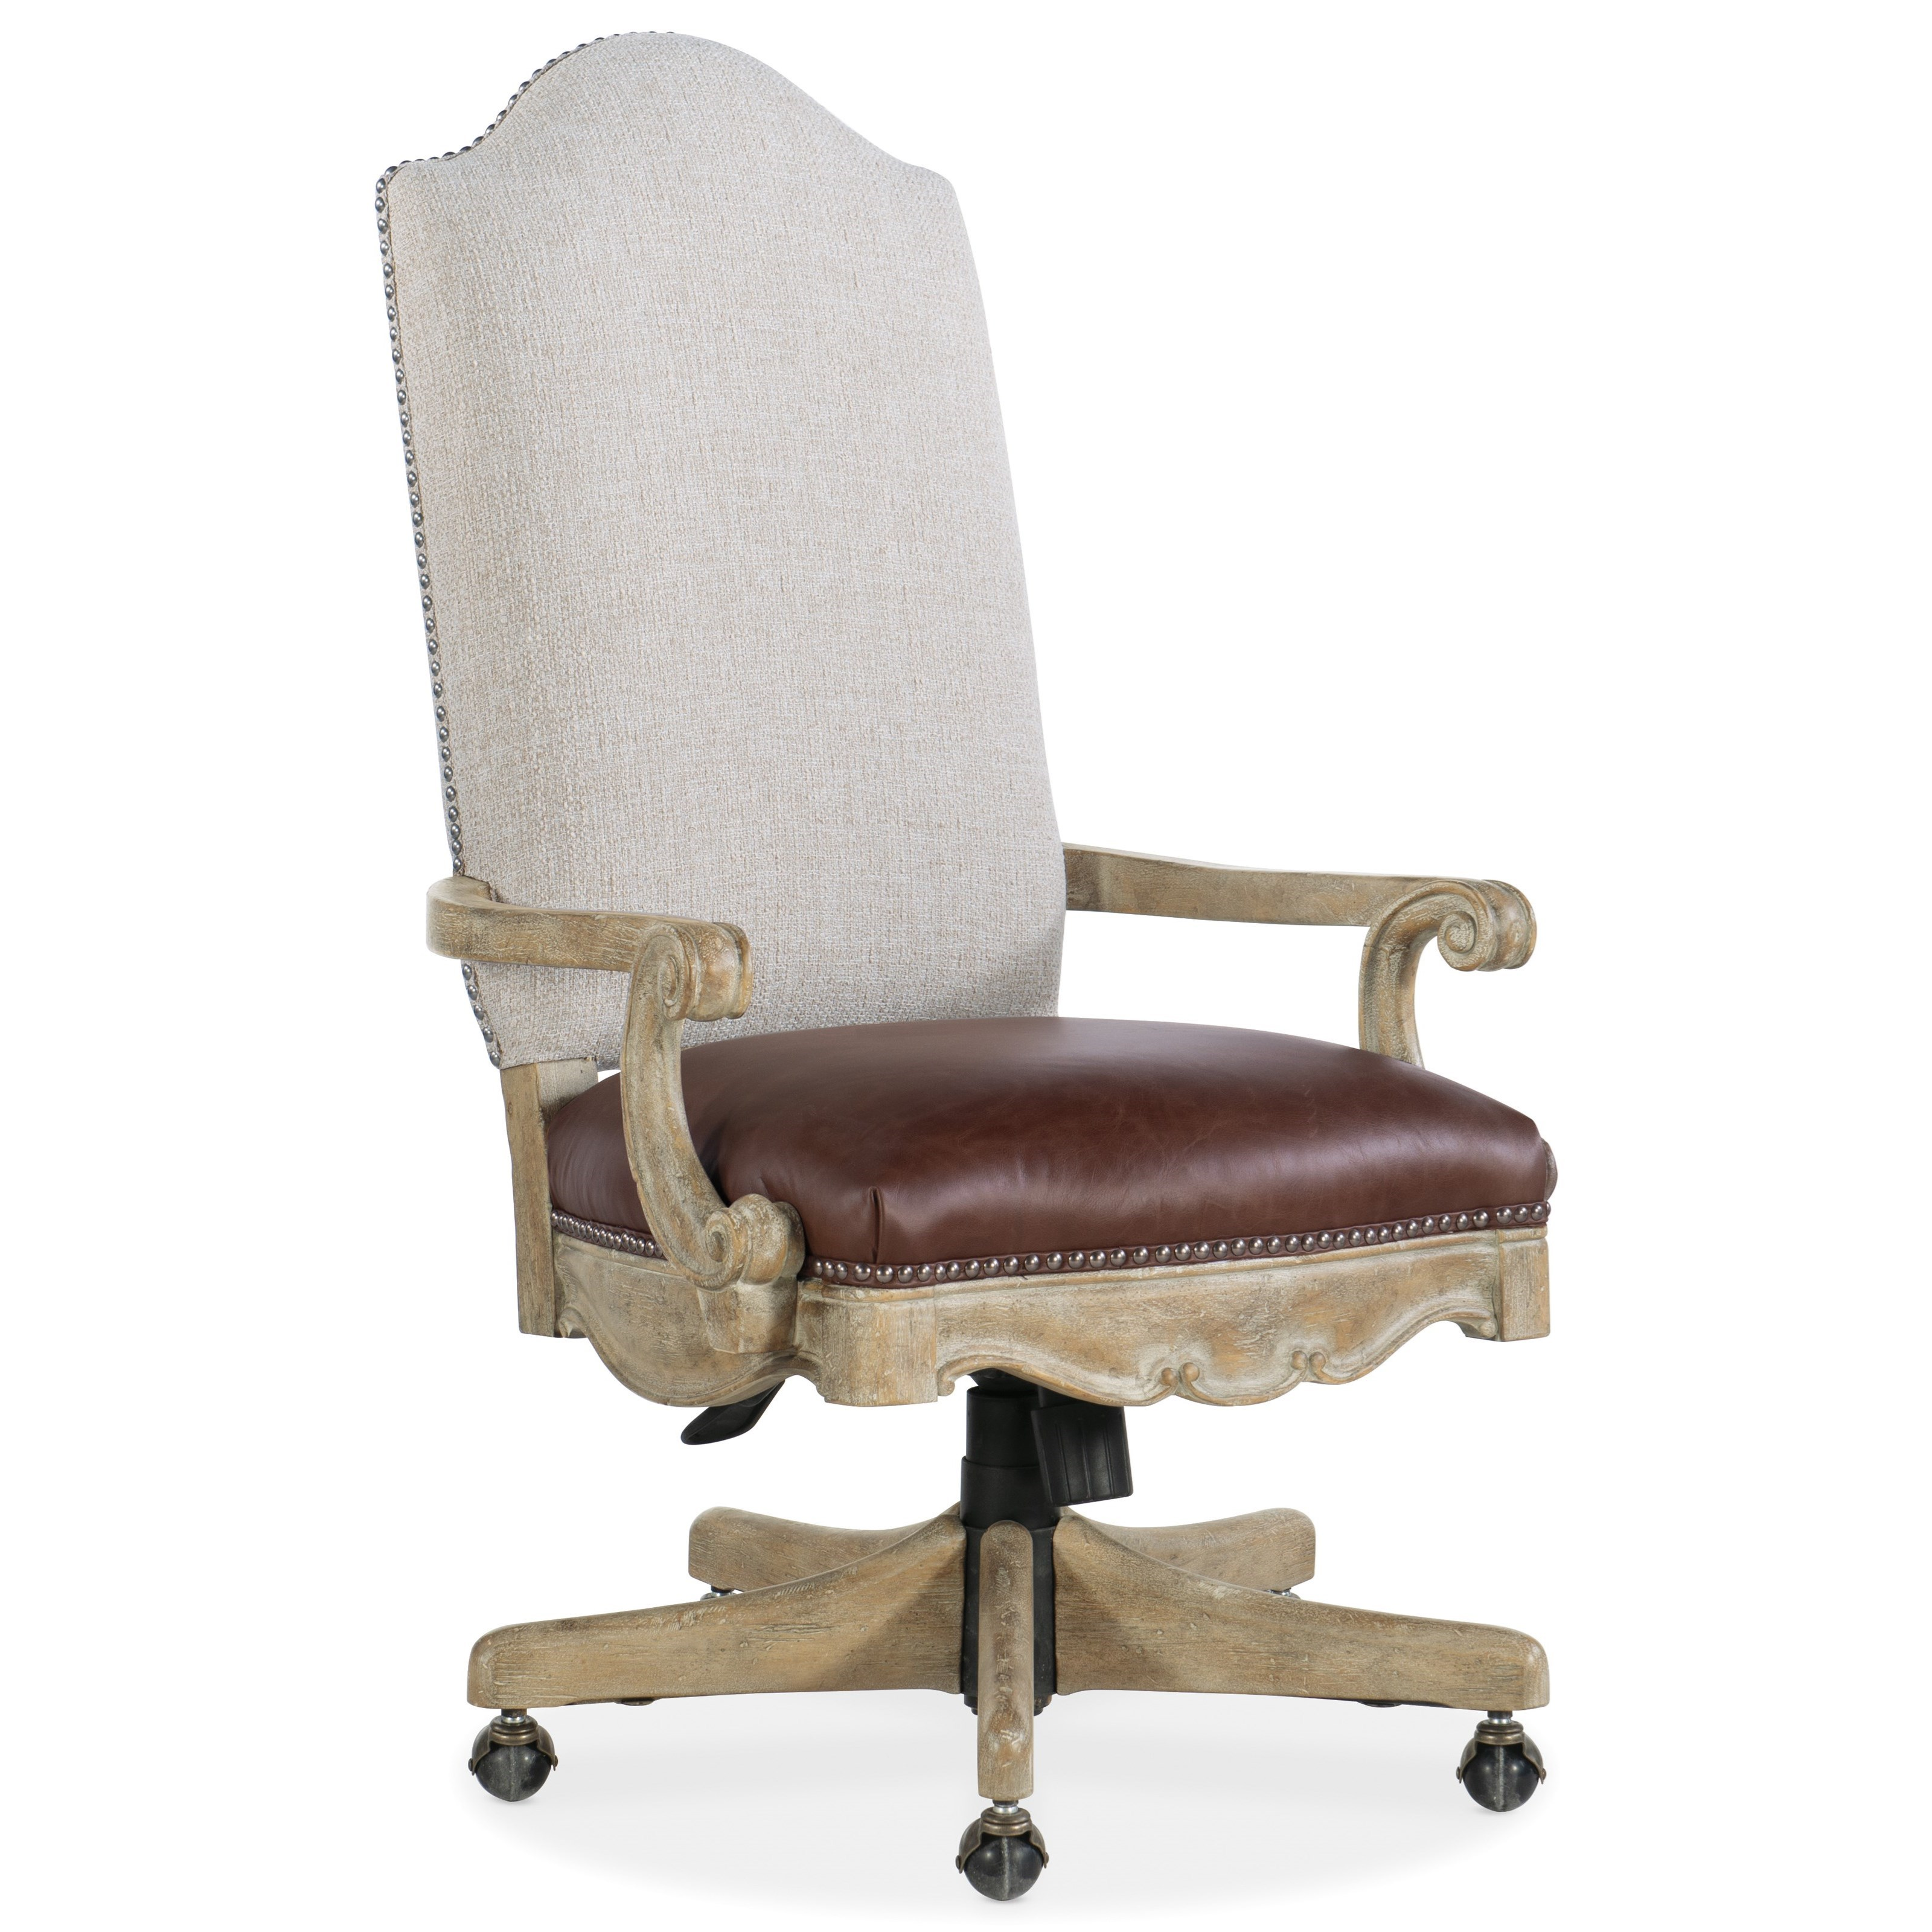 Castella Tilt Swivel Chair by Hooker Furniture at Alison Craig Home Furnishings